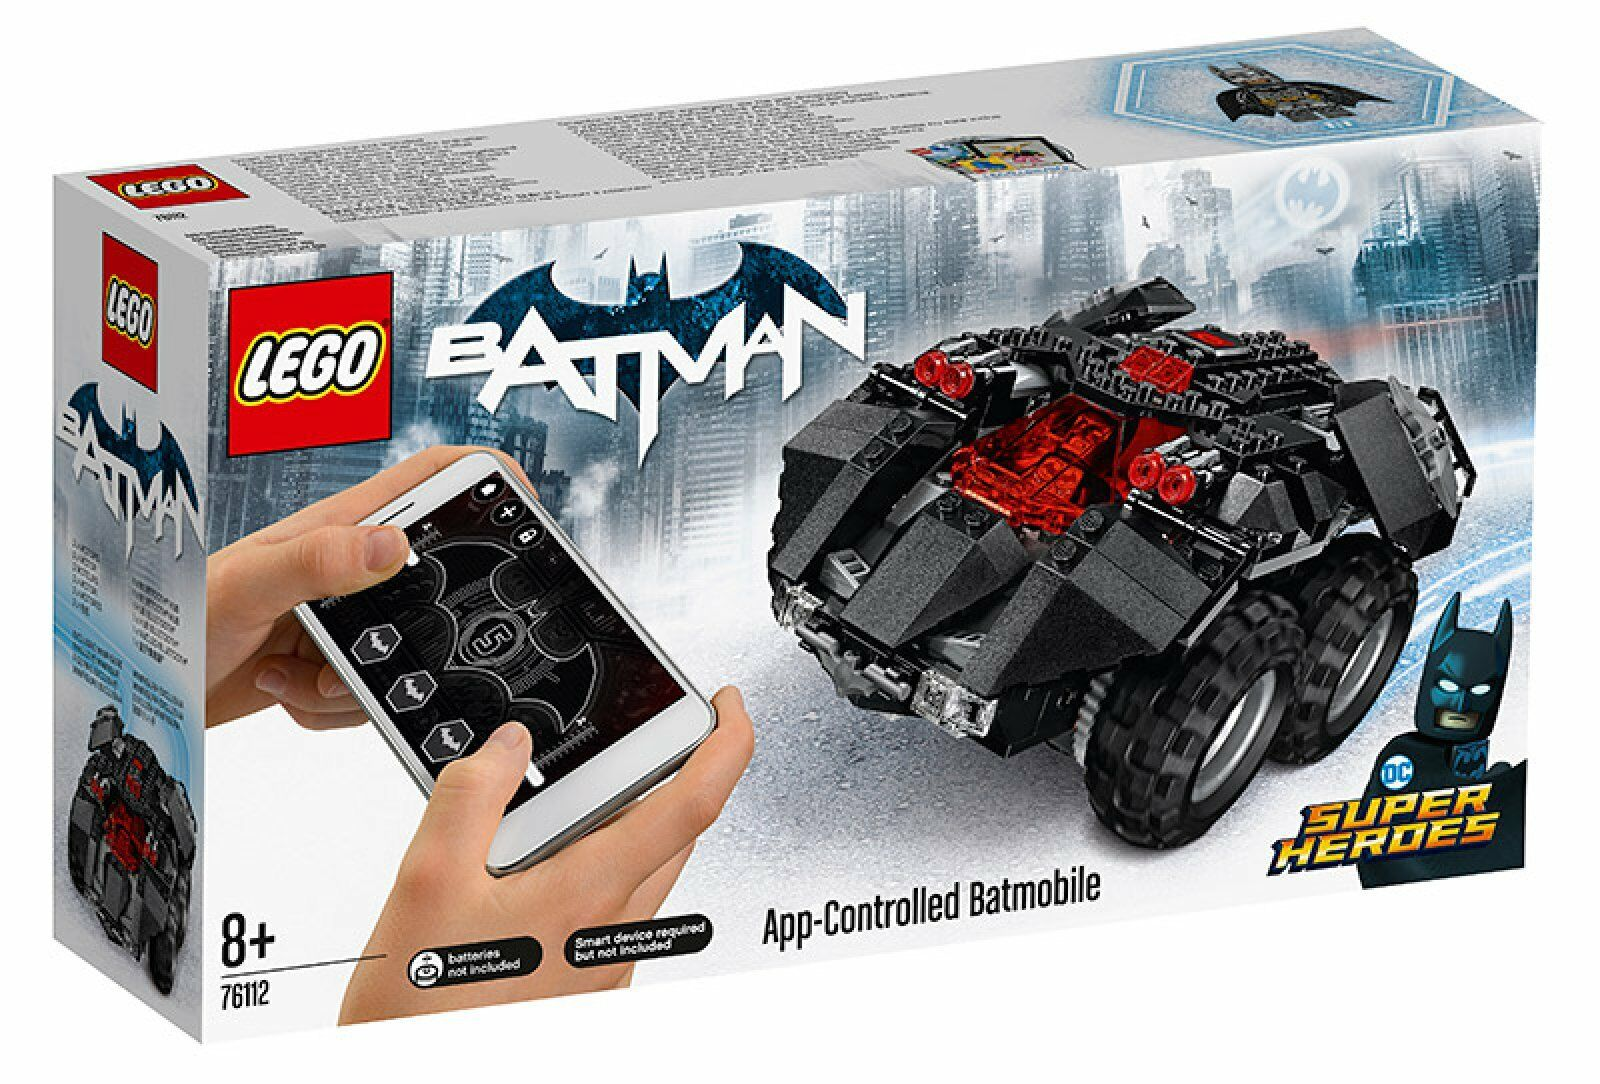 76112 LEGO DC Superh. Batmobile telecomandata